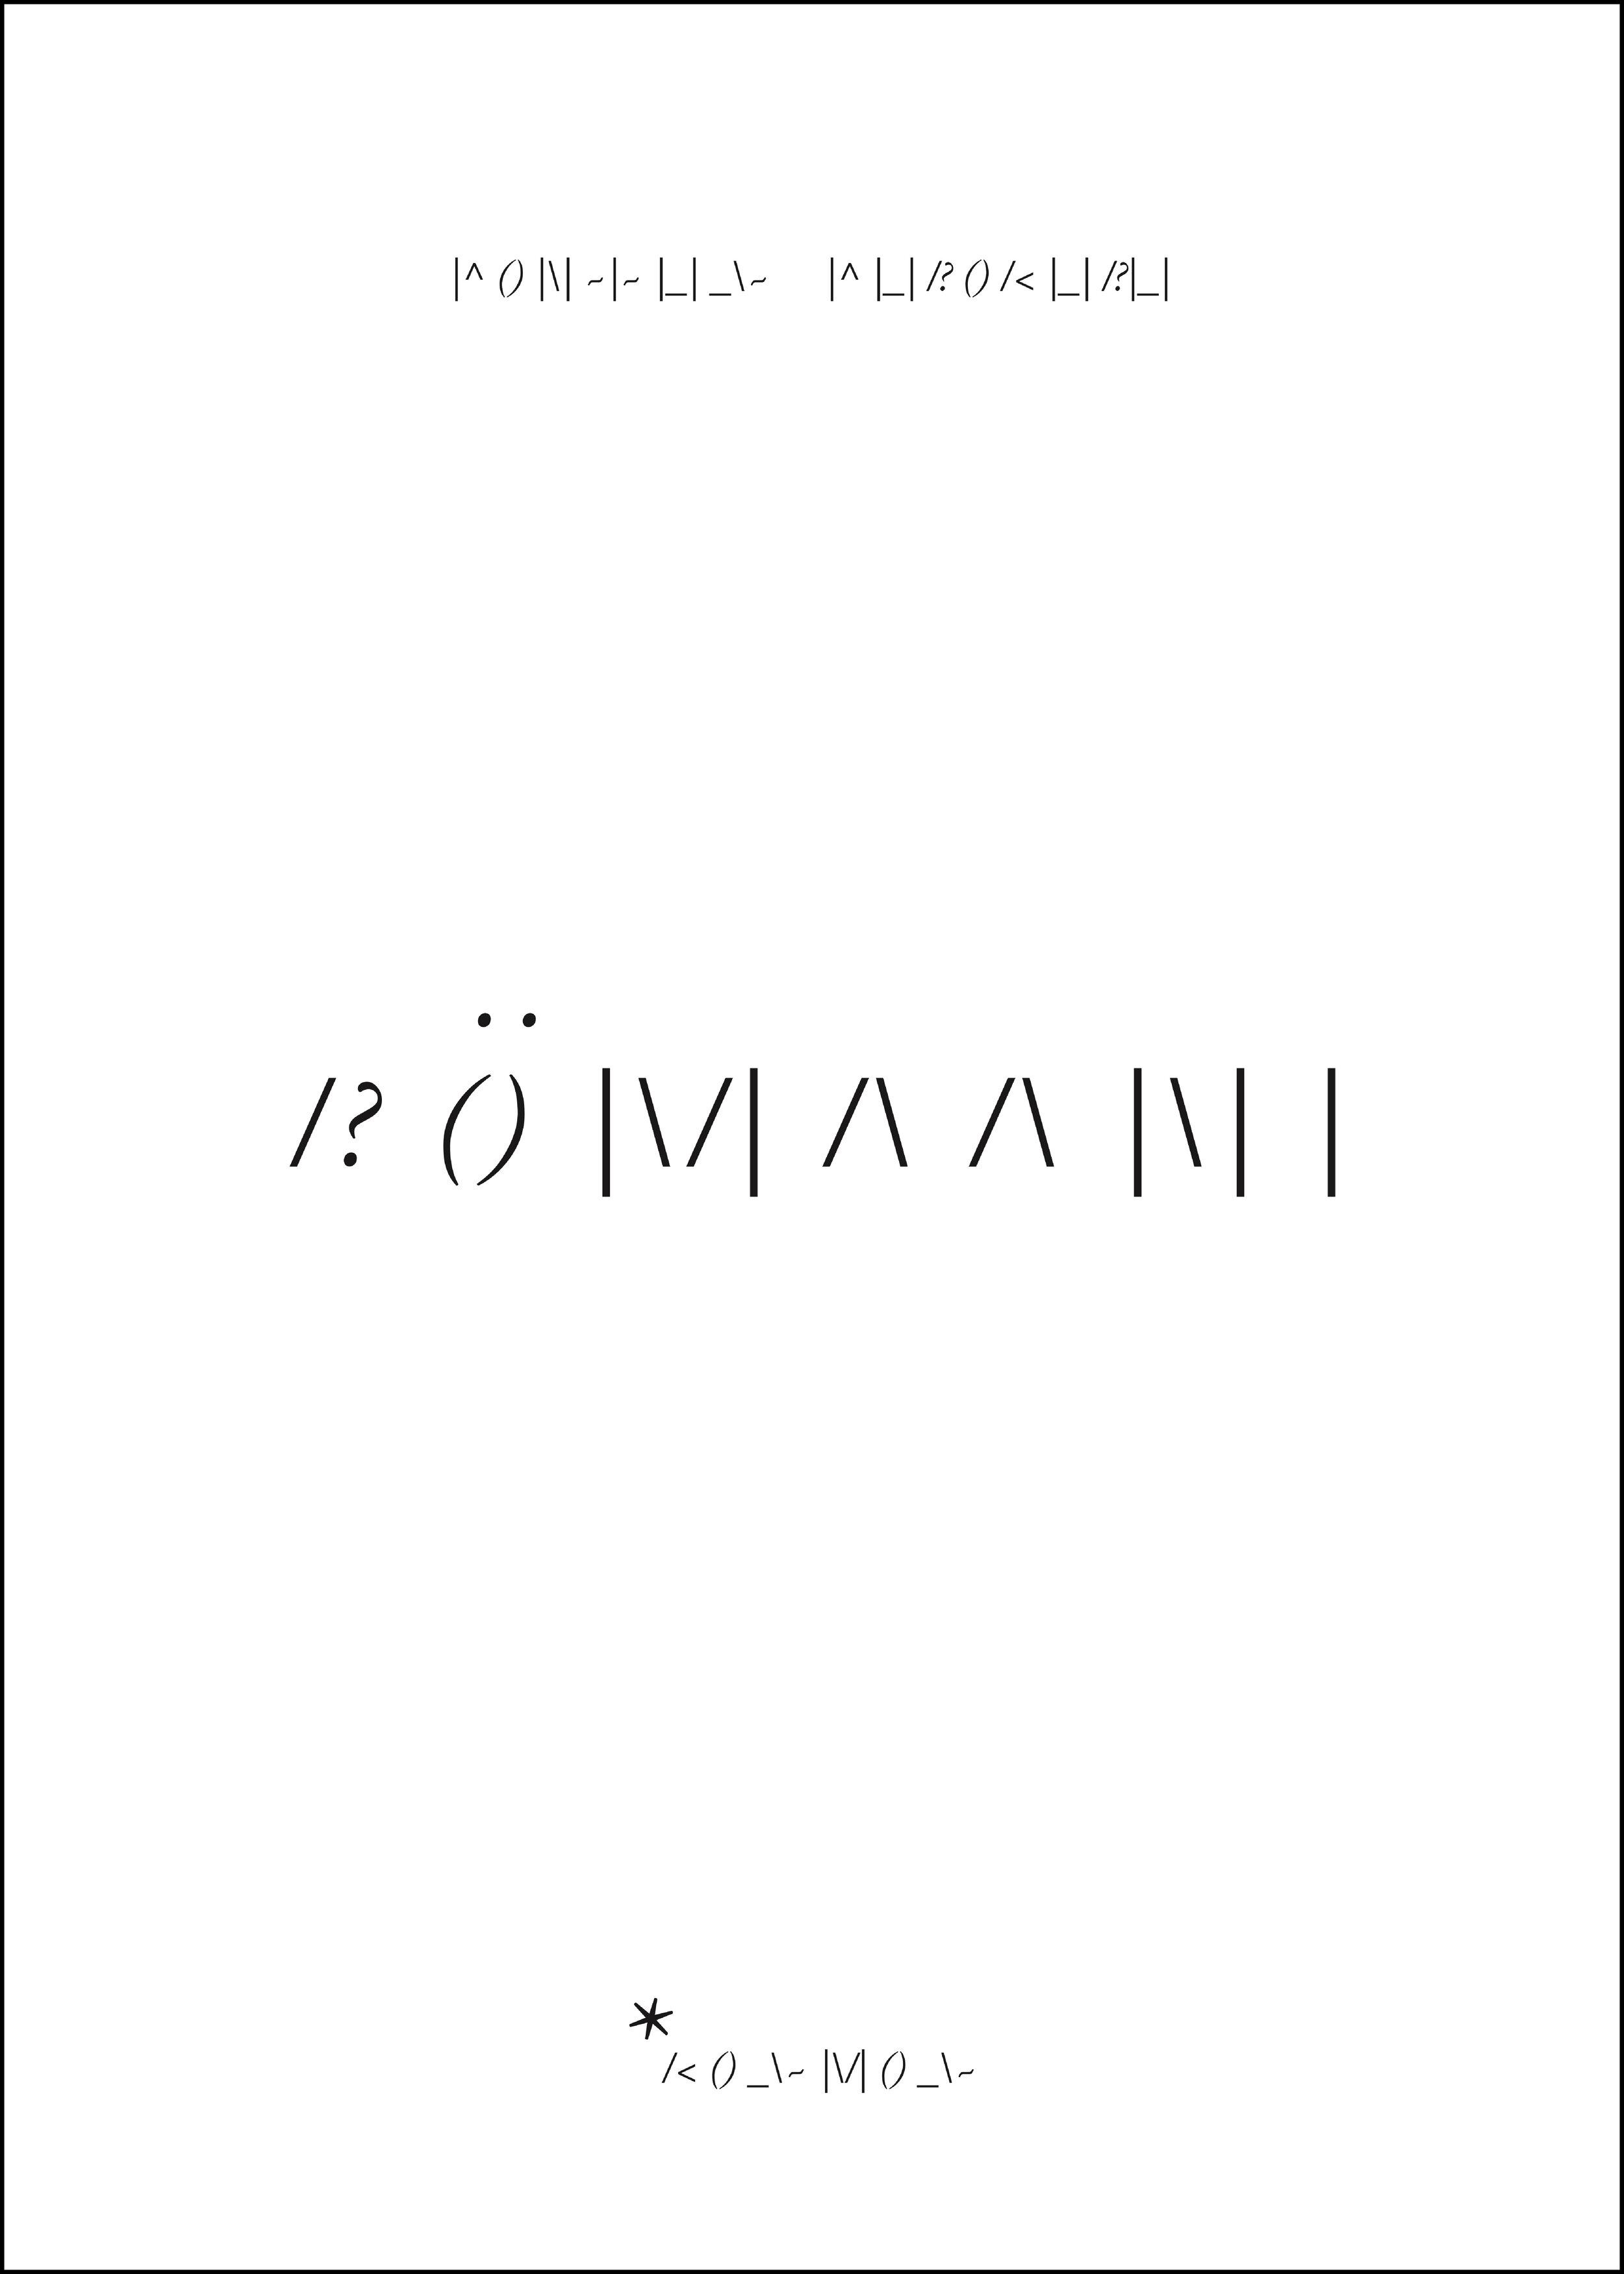 römaani_kansi.jpg